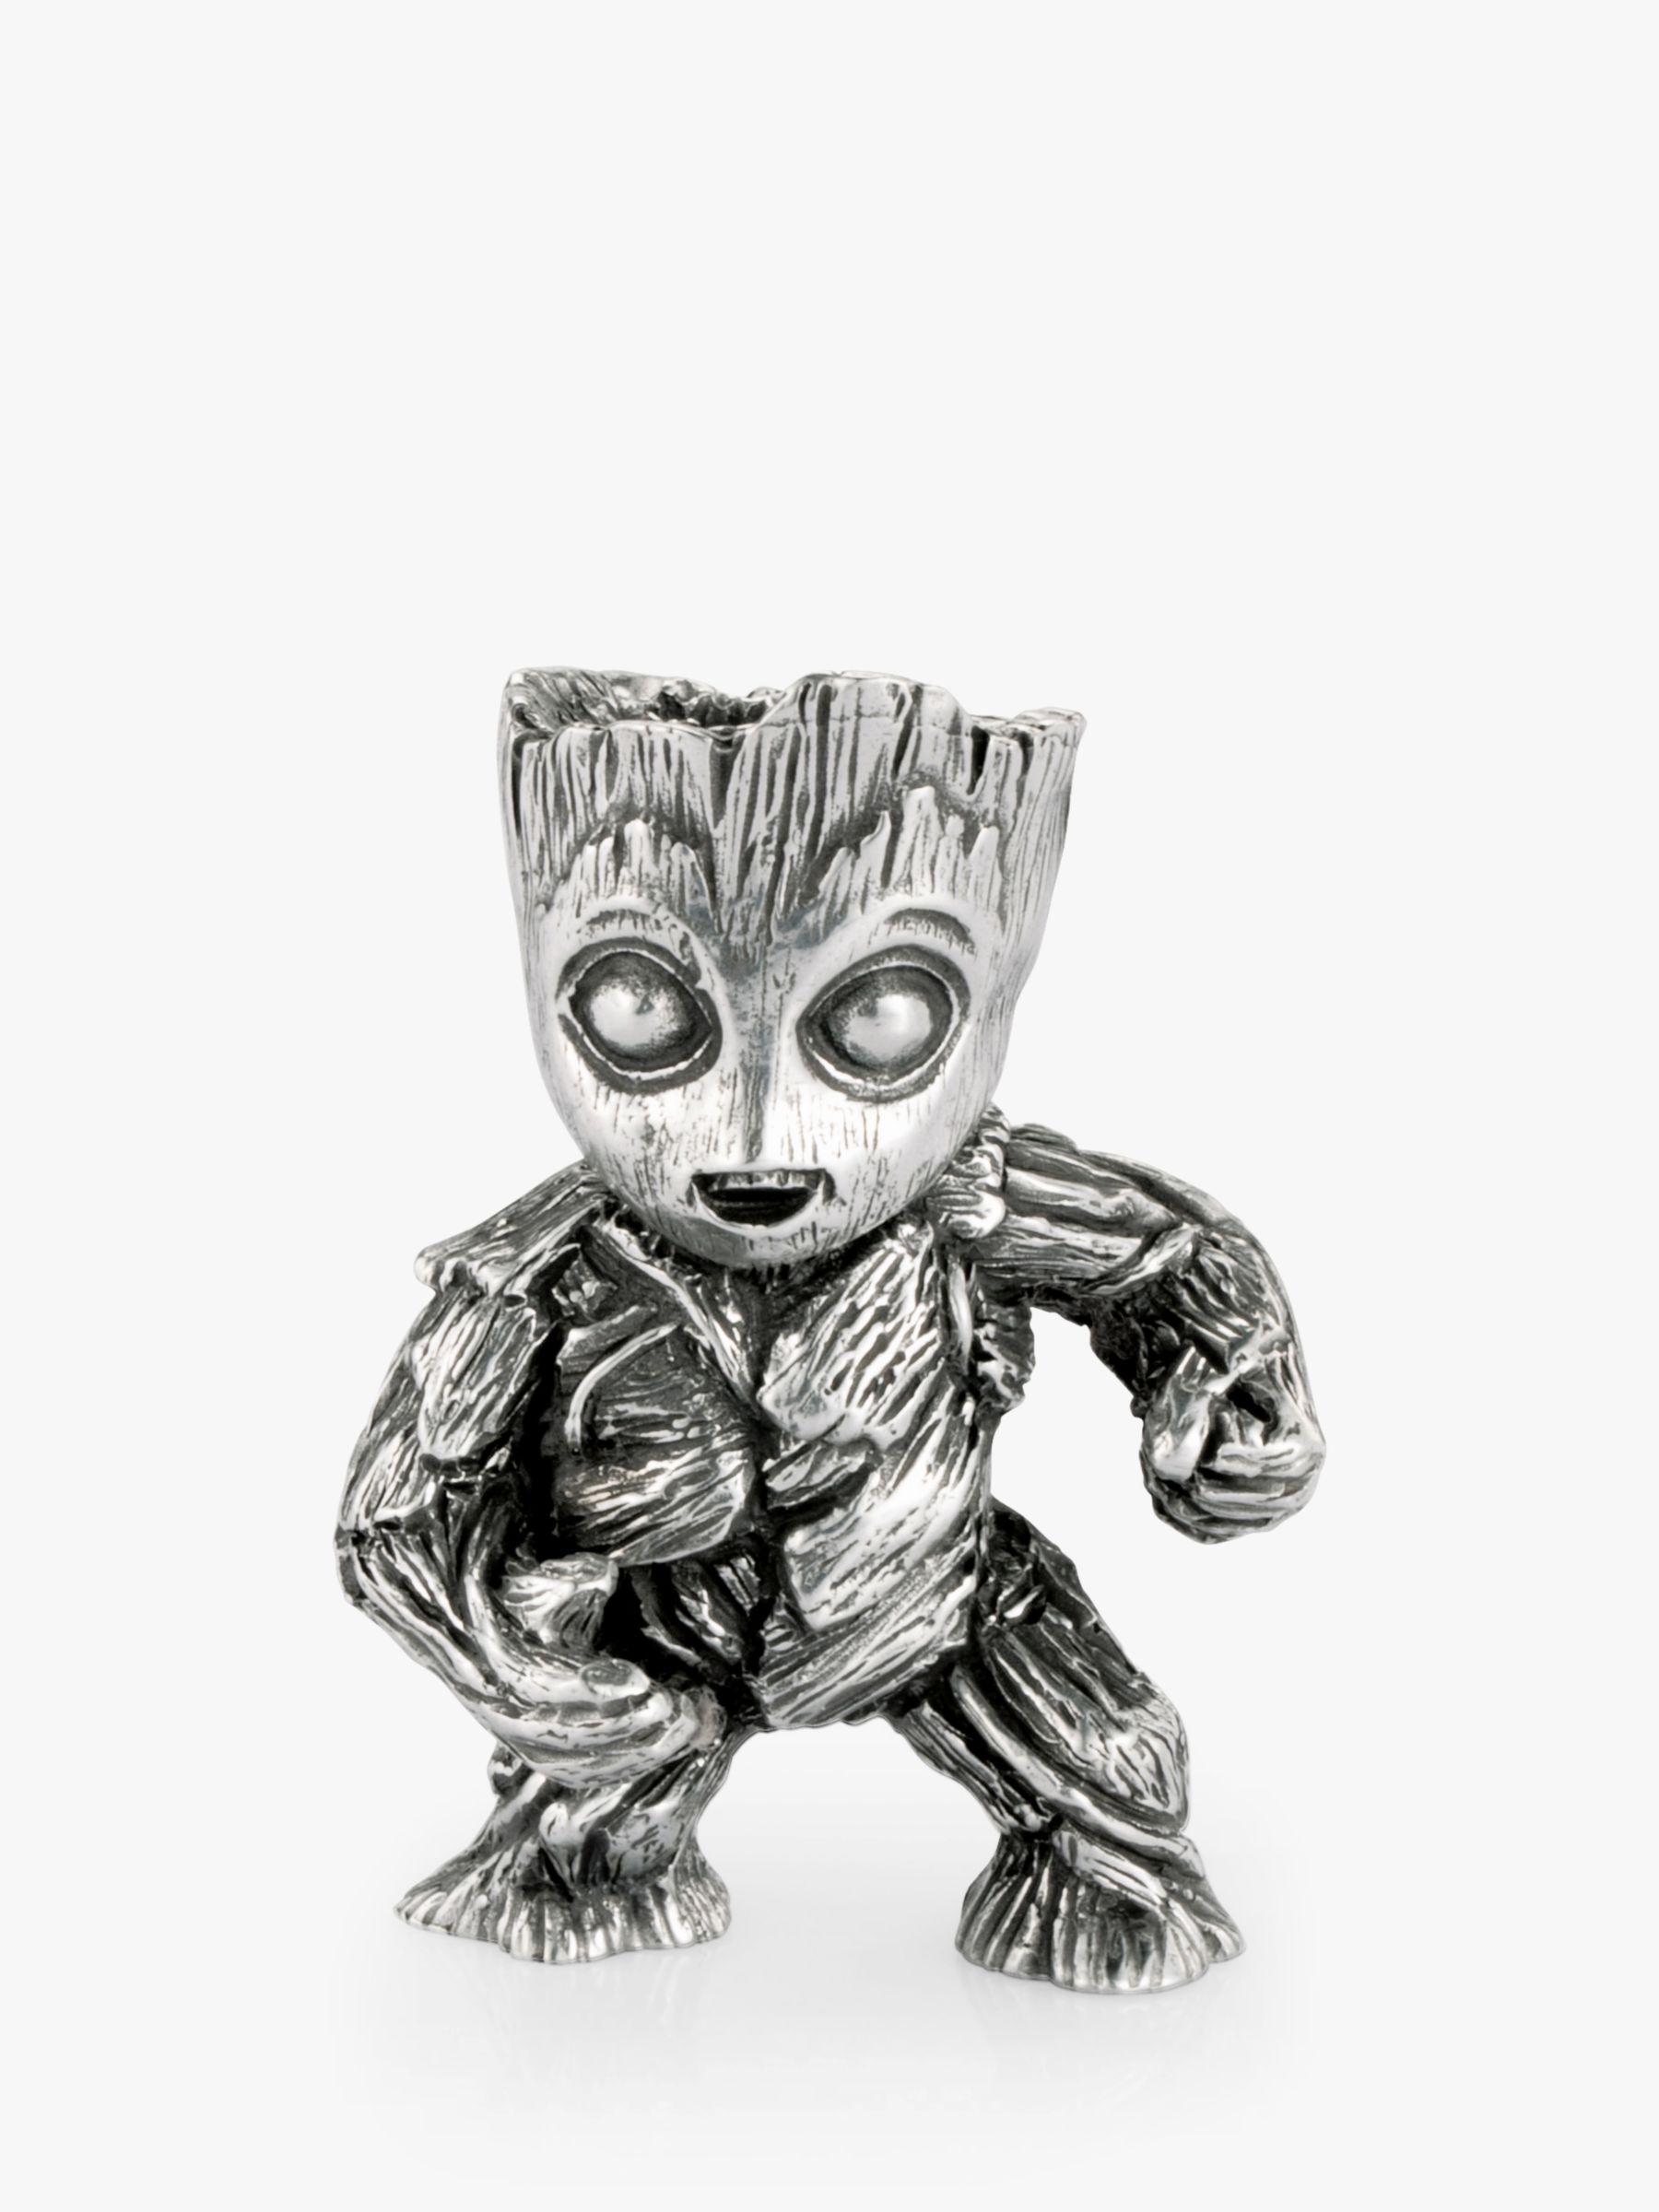 Royal Selangor Royal Selangor Miniature Marvel Groot Figurine